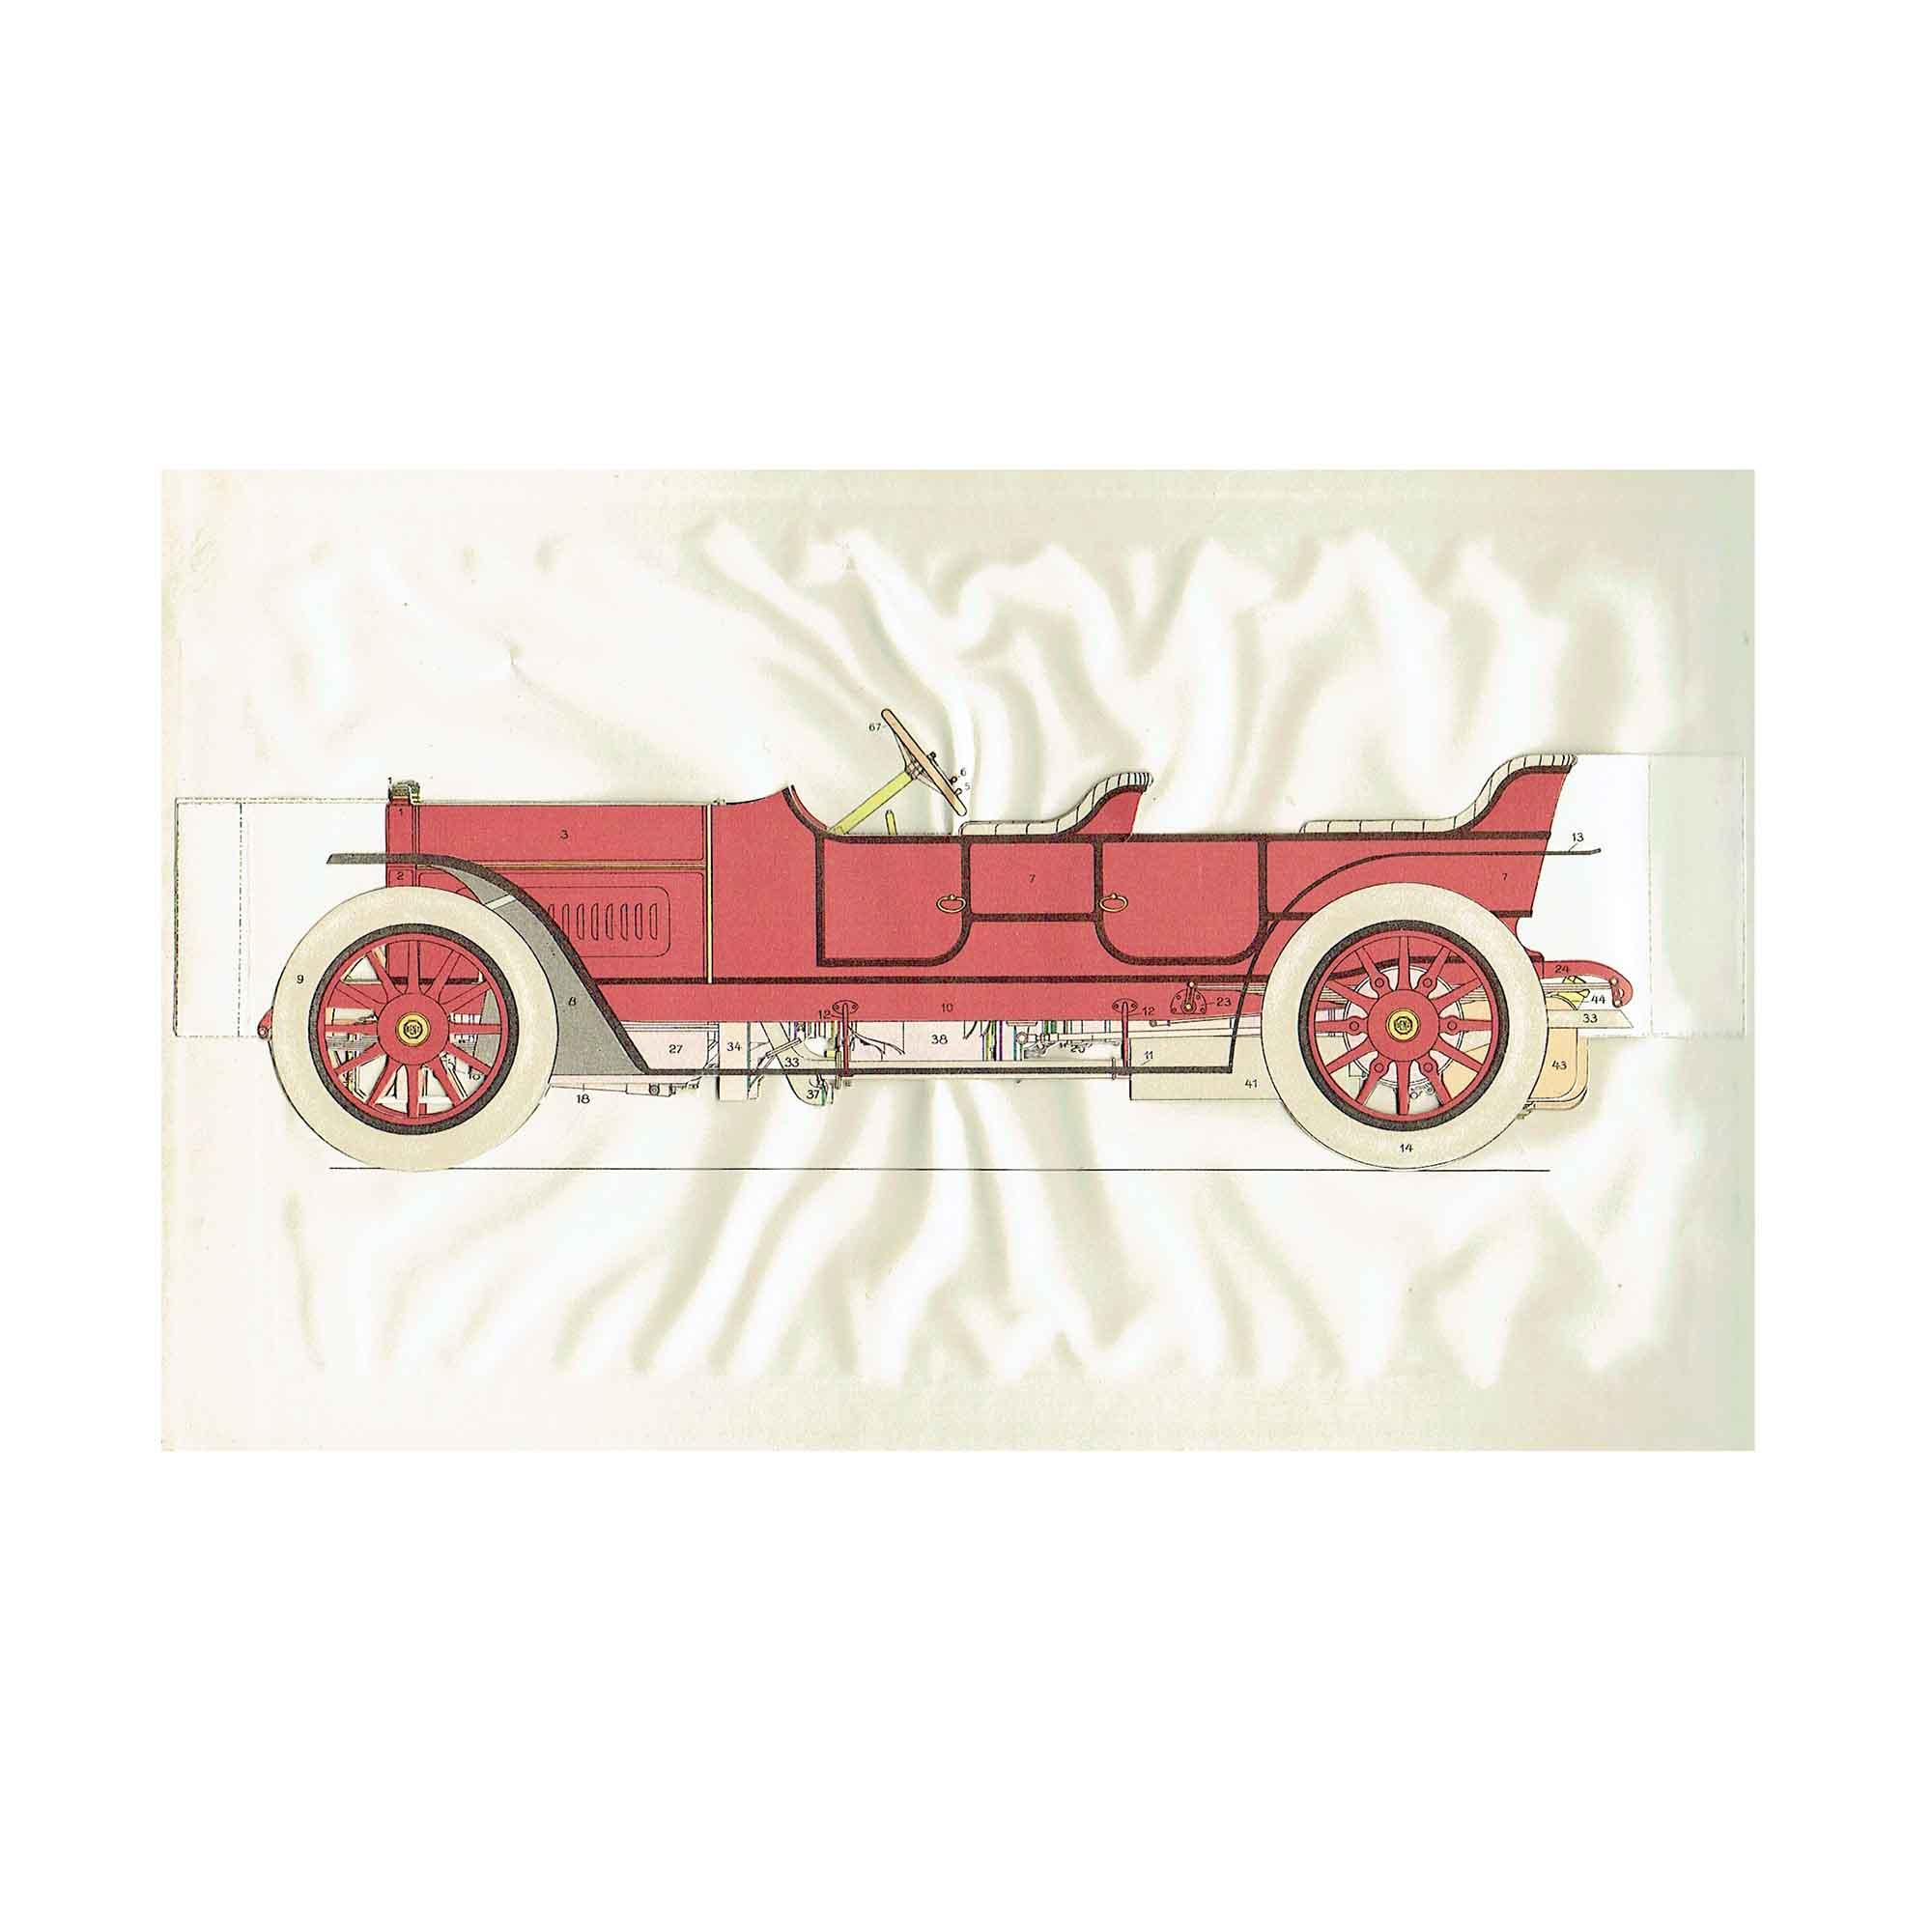 5452-Benz-Modell-1910-1-N.jpg